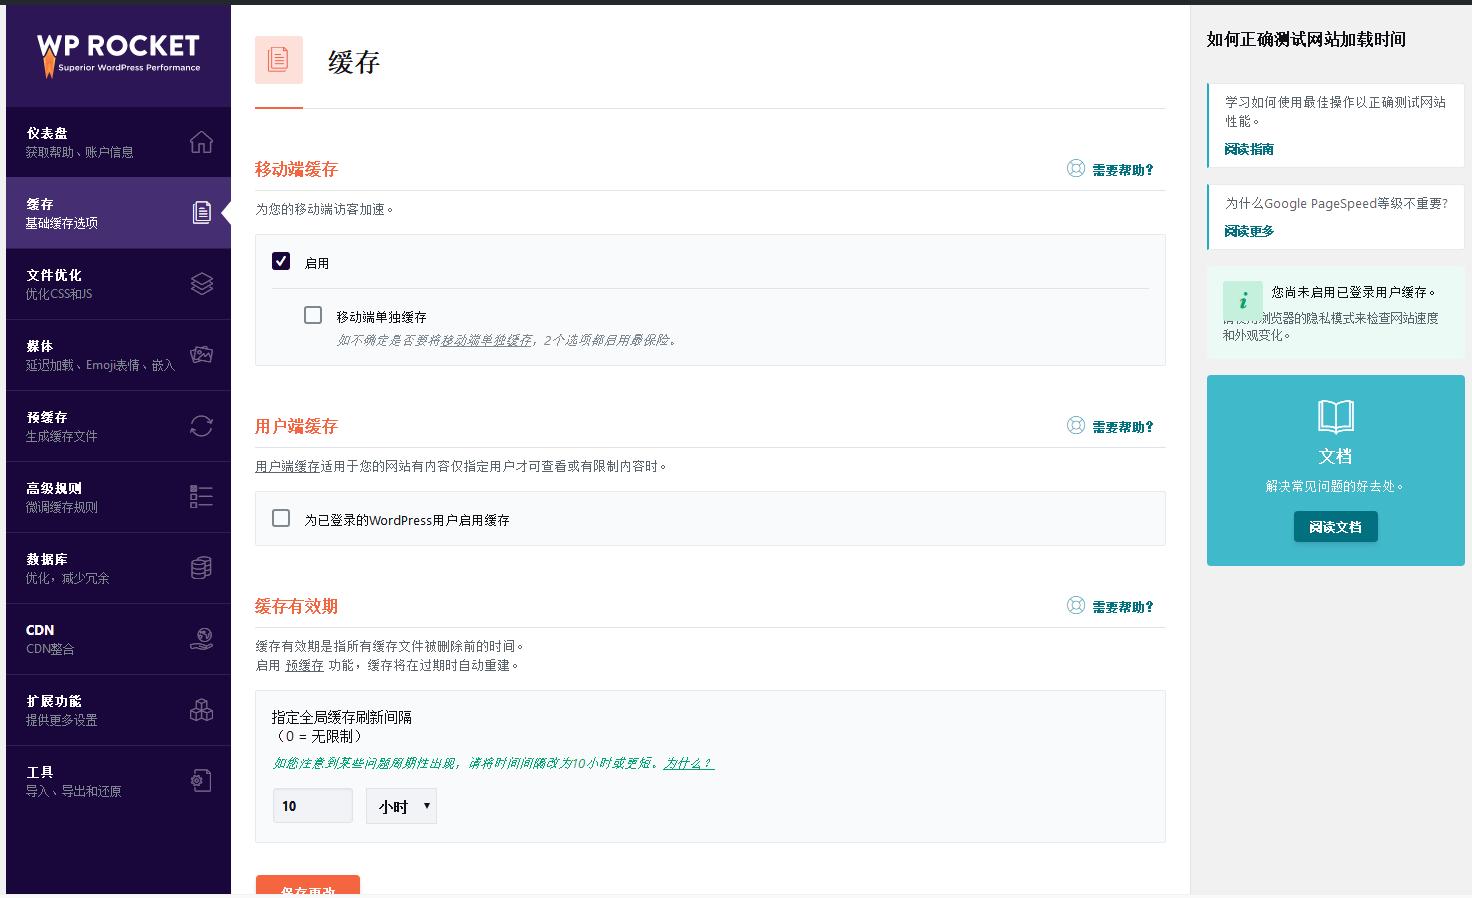 WP Rocket v3.5.4汉化专业版